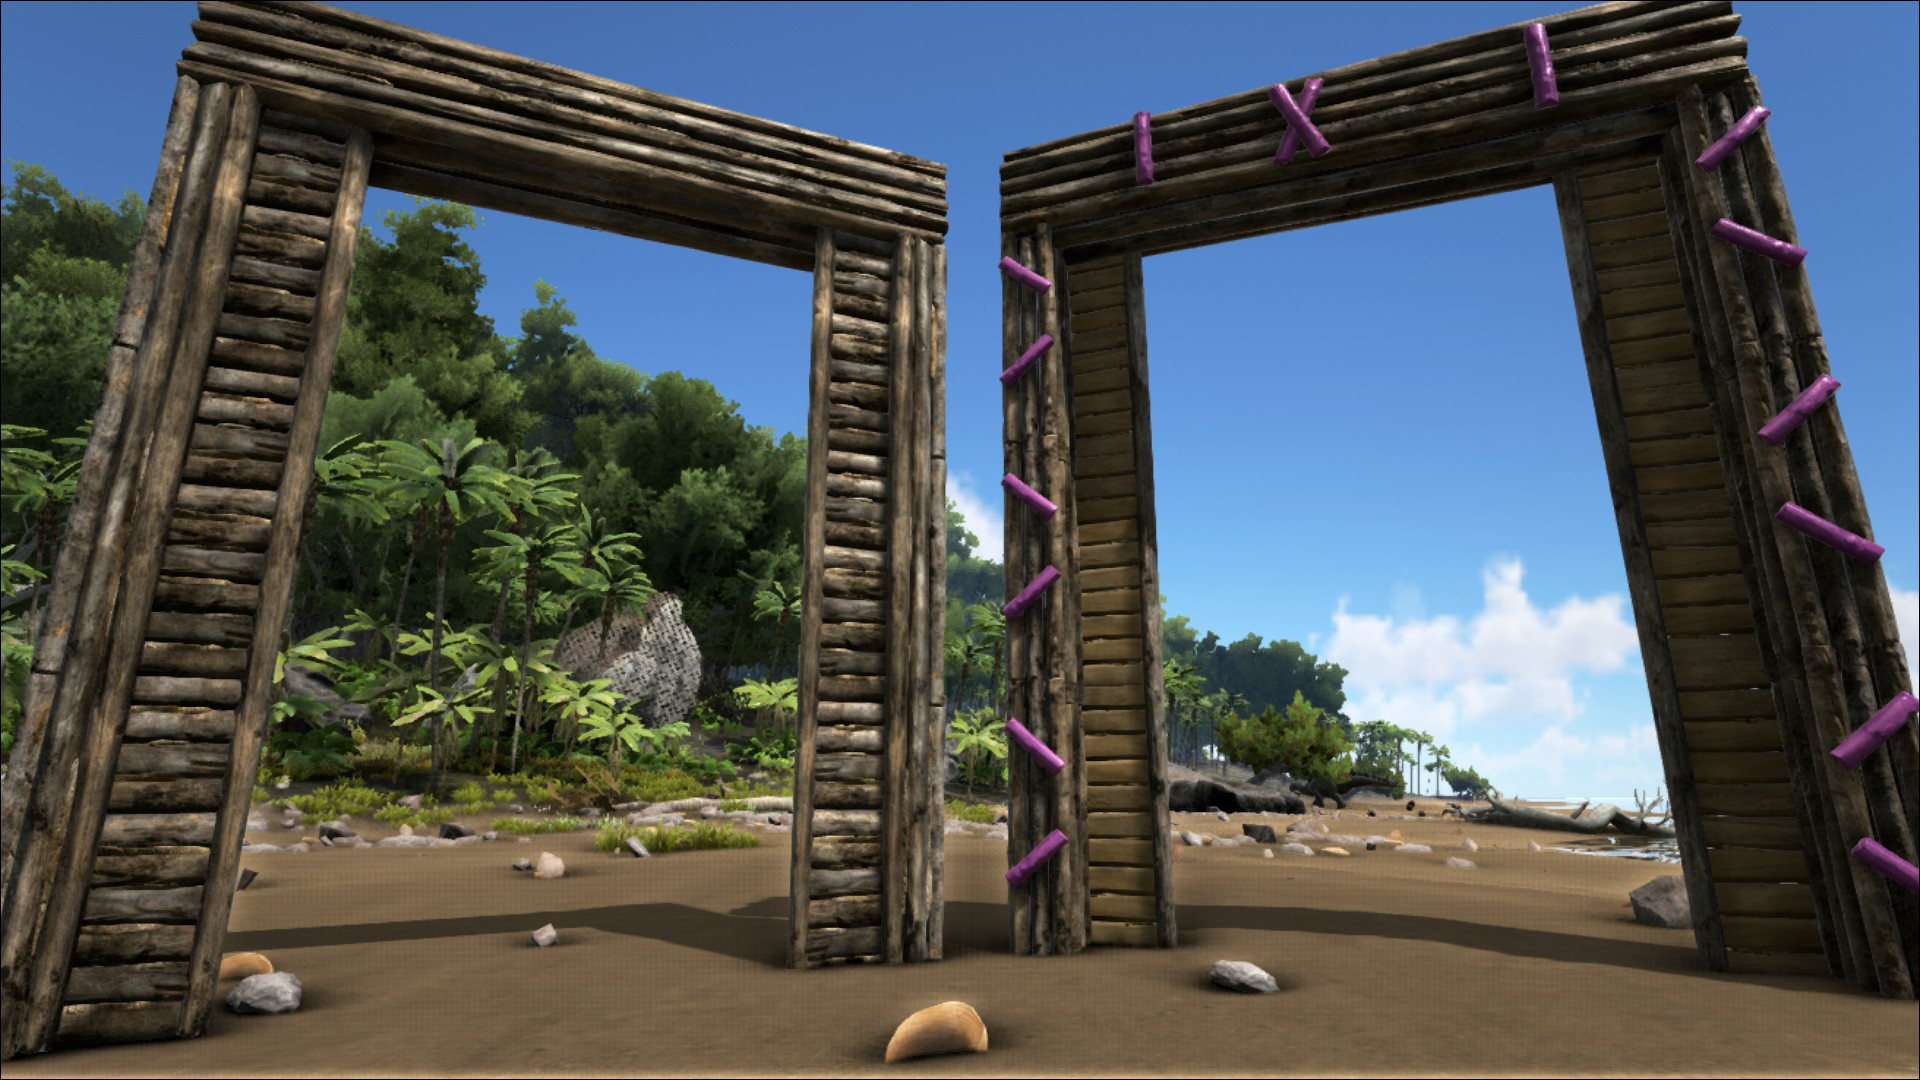 Region 1 Region 2 Region 3 Region 5 & Dinosaur Gateway - Official ARK: Survival Evolved Wiki Pezcame.Com